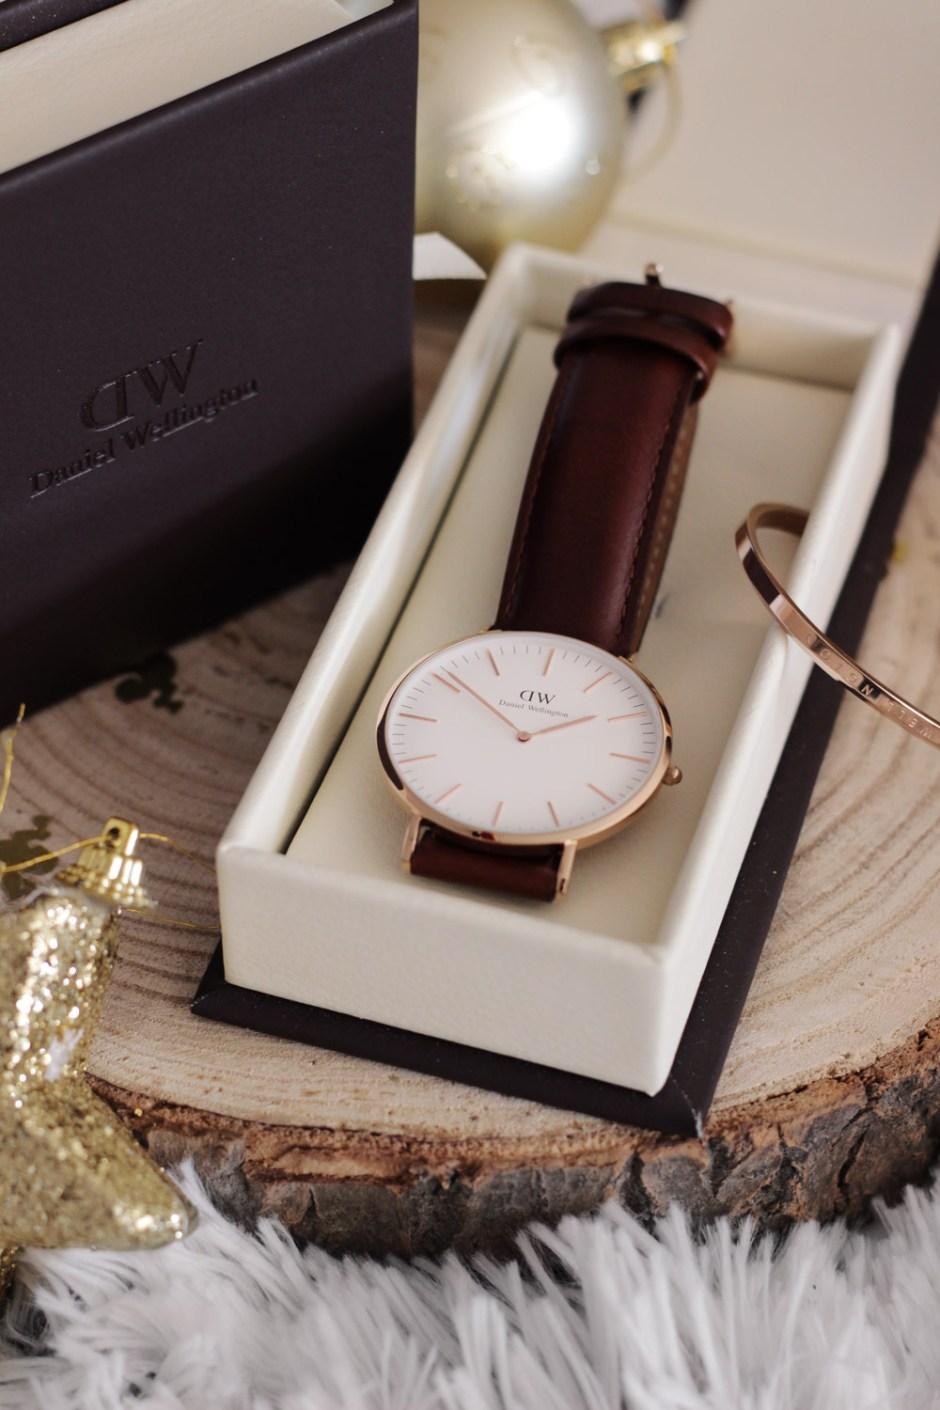 daniel-wellington-montre-idee-cadeau-noel